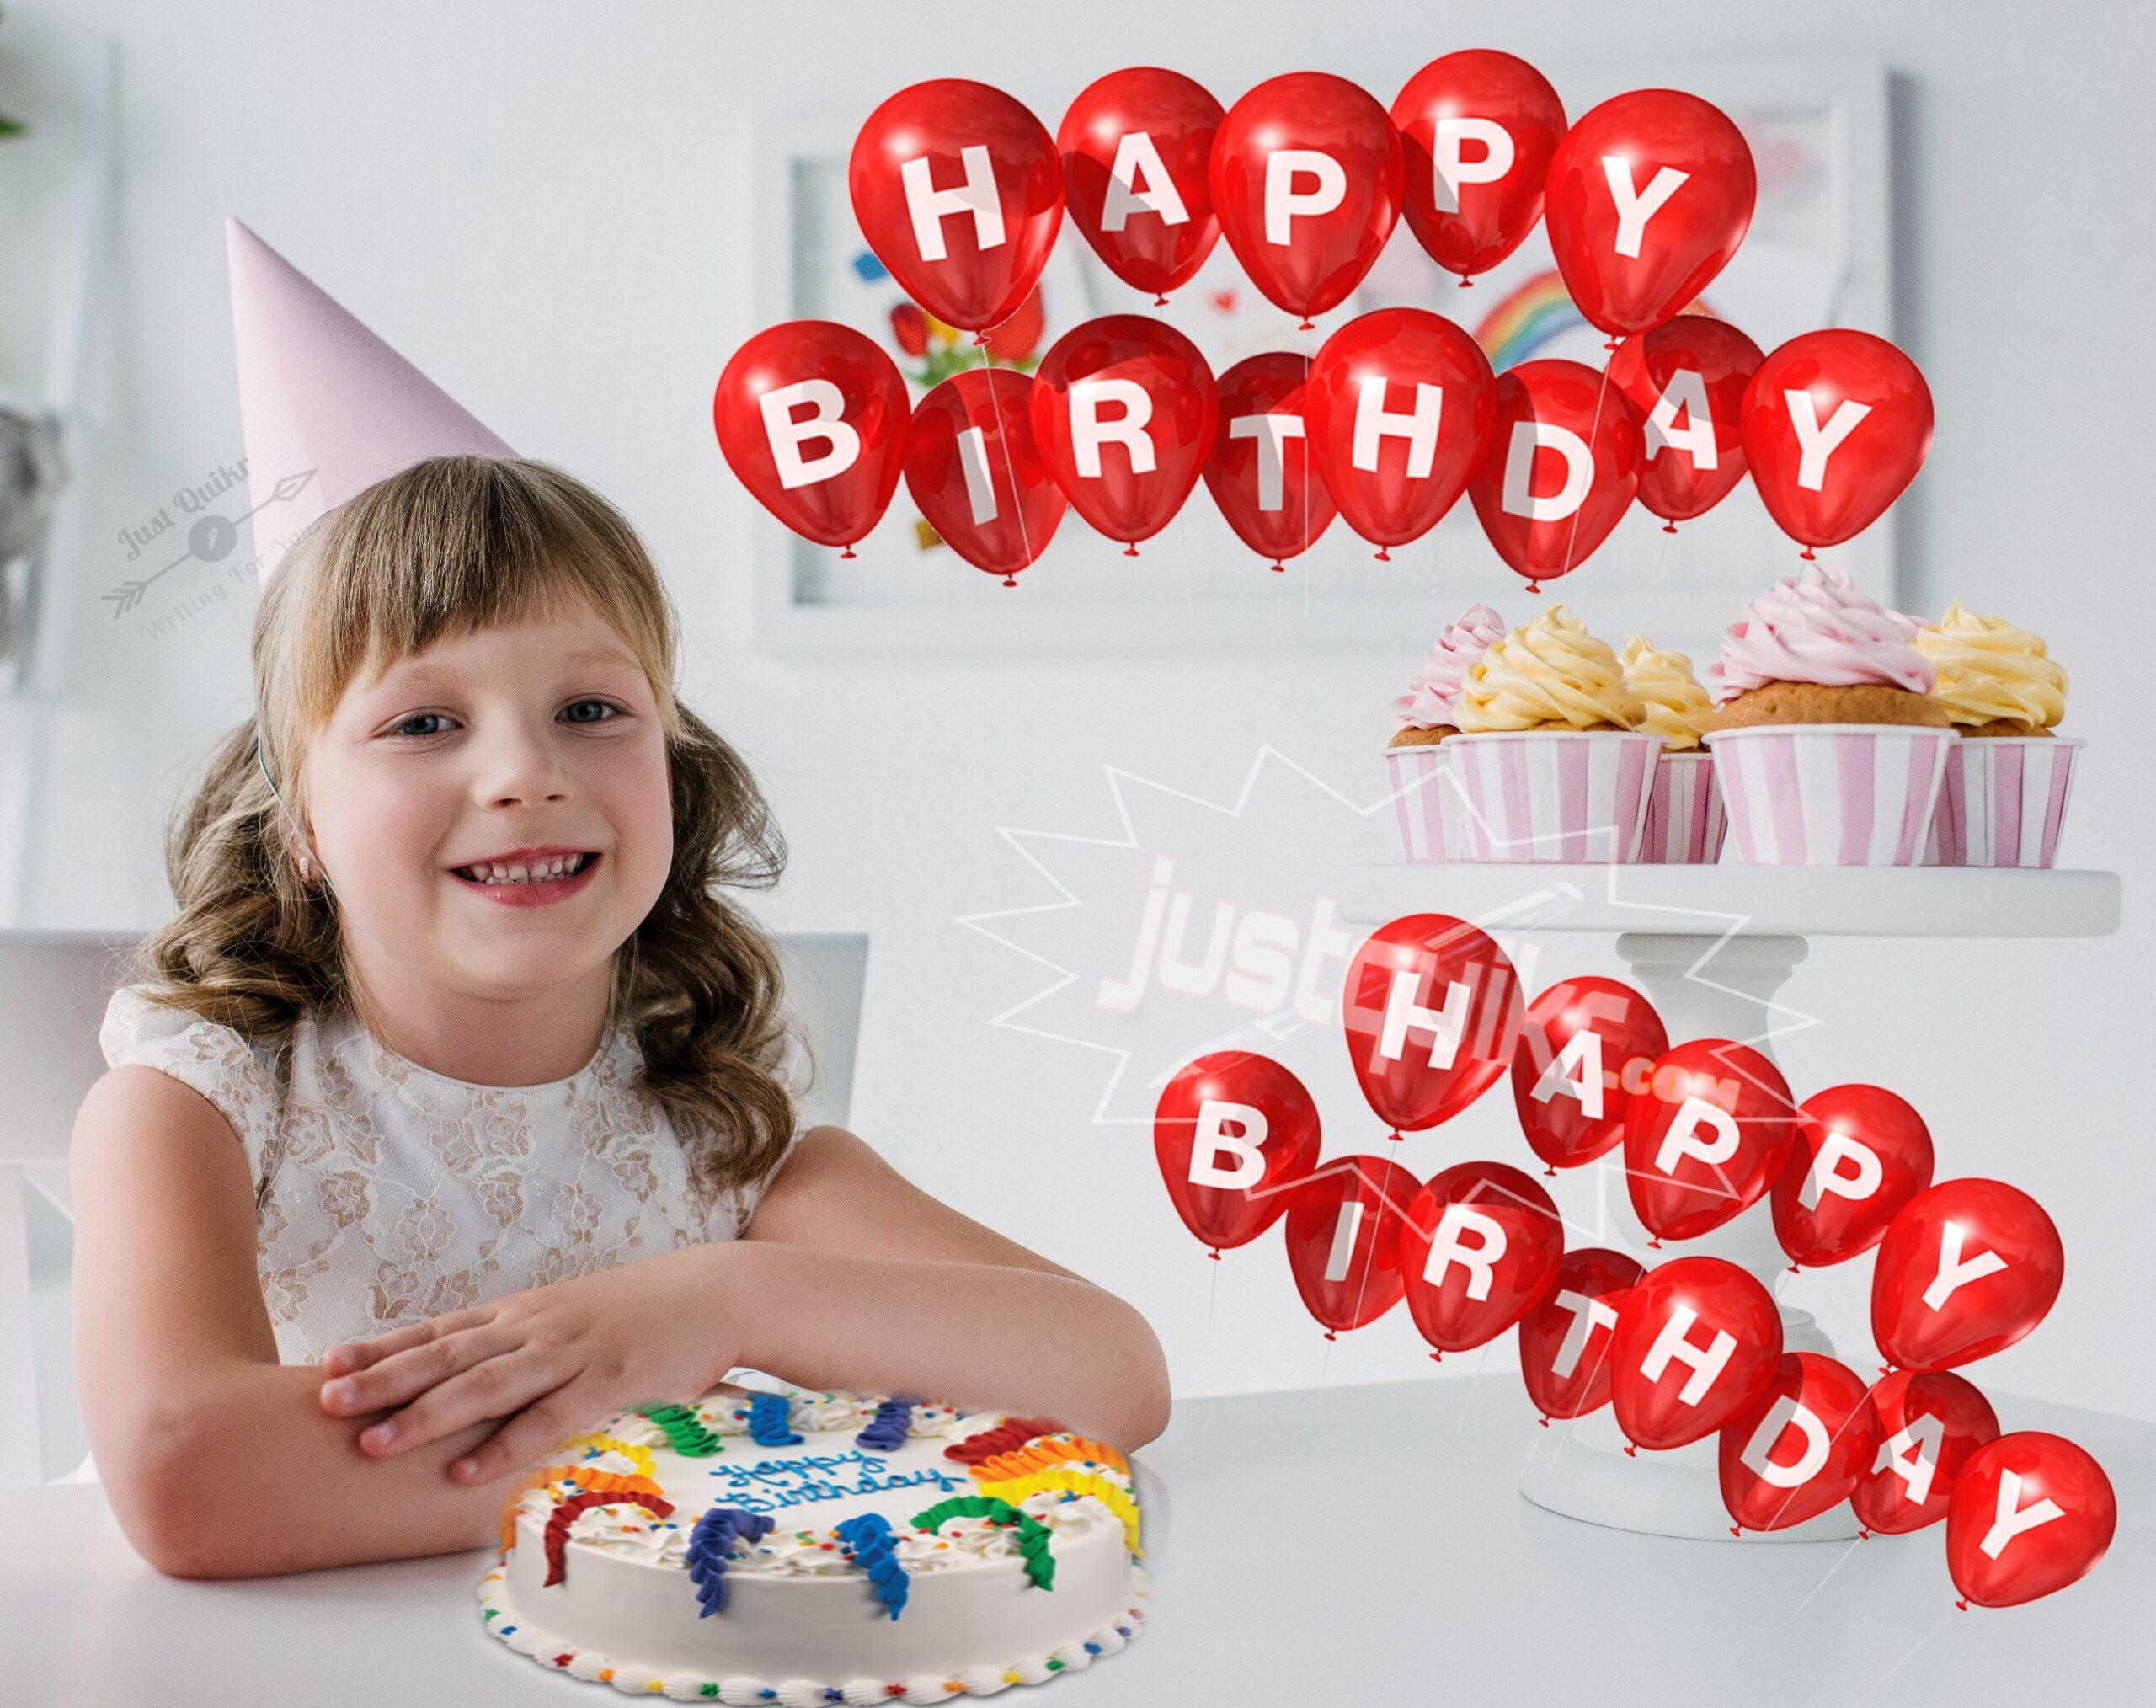 CreativeHappy Birthday Wishing Cake Status Images for Little Girl